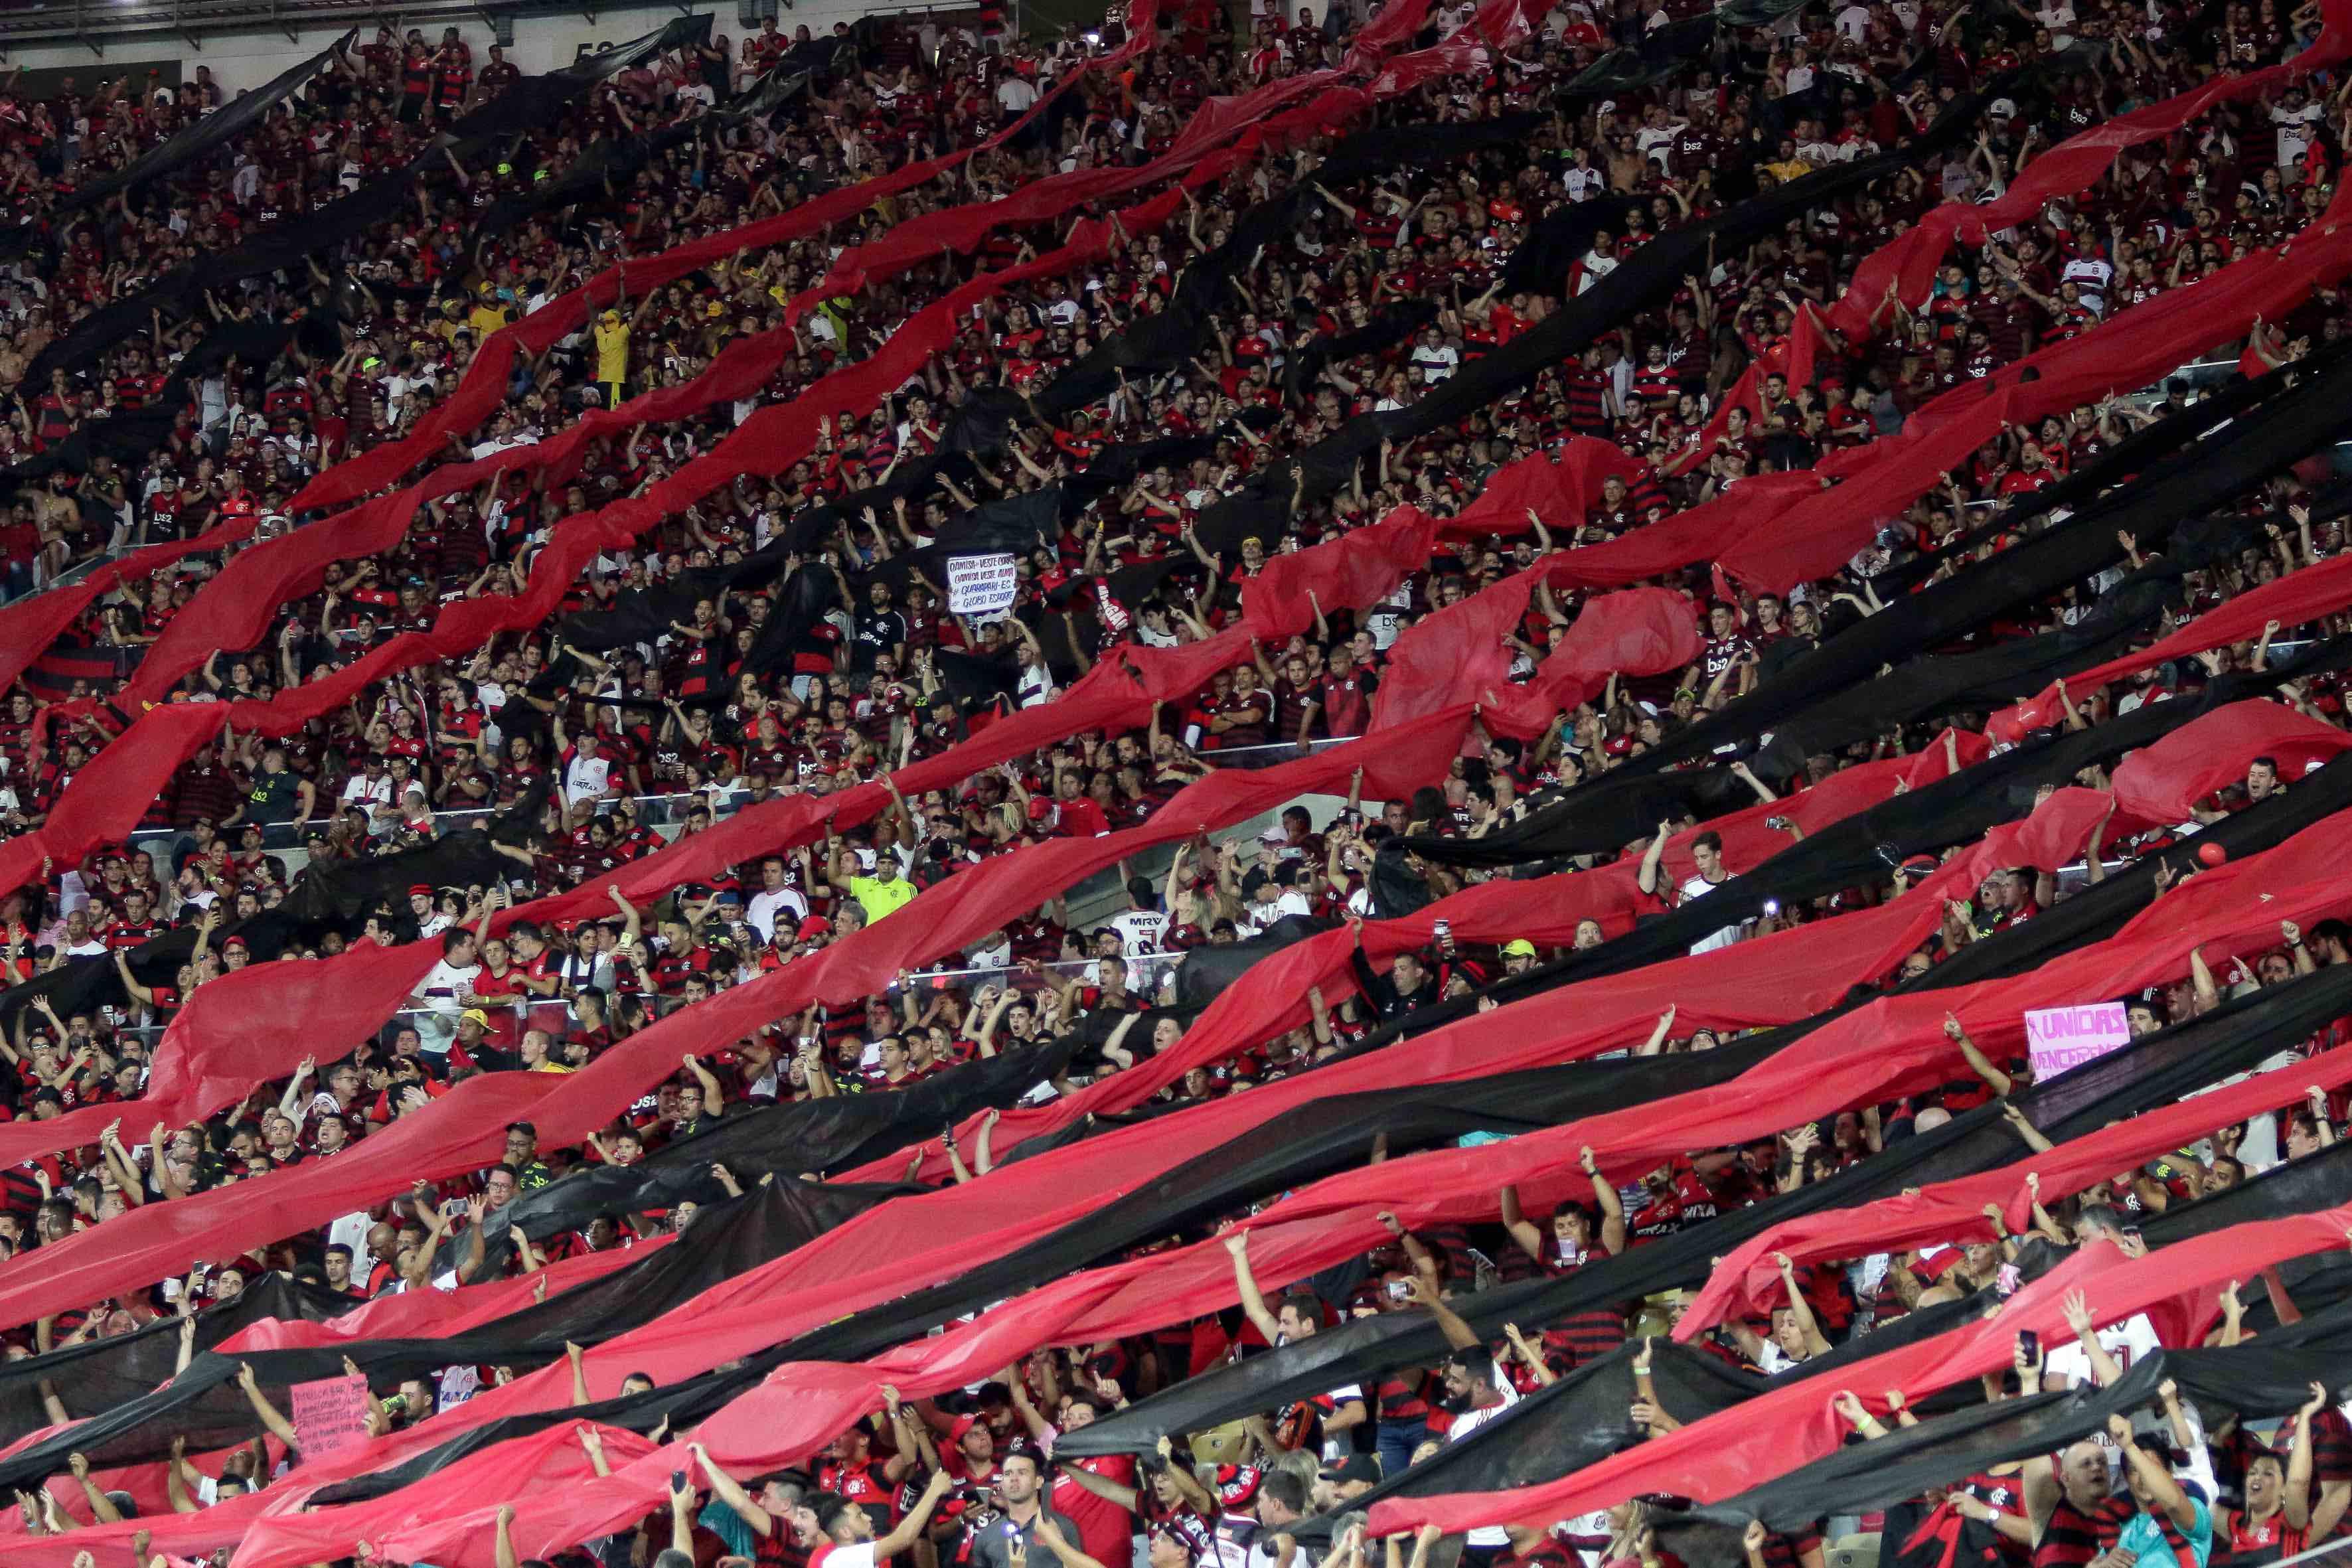 Foto da torcida do Flamengo